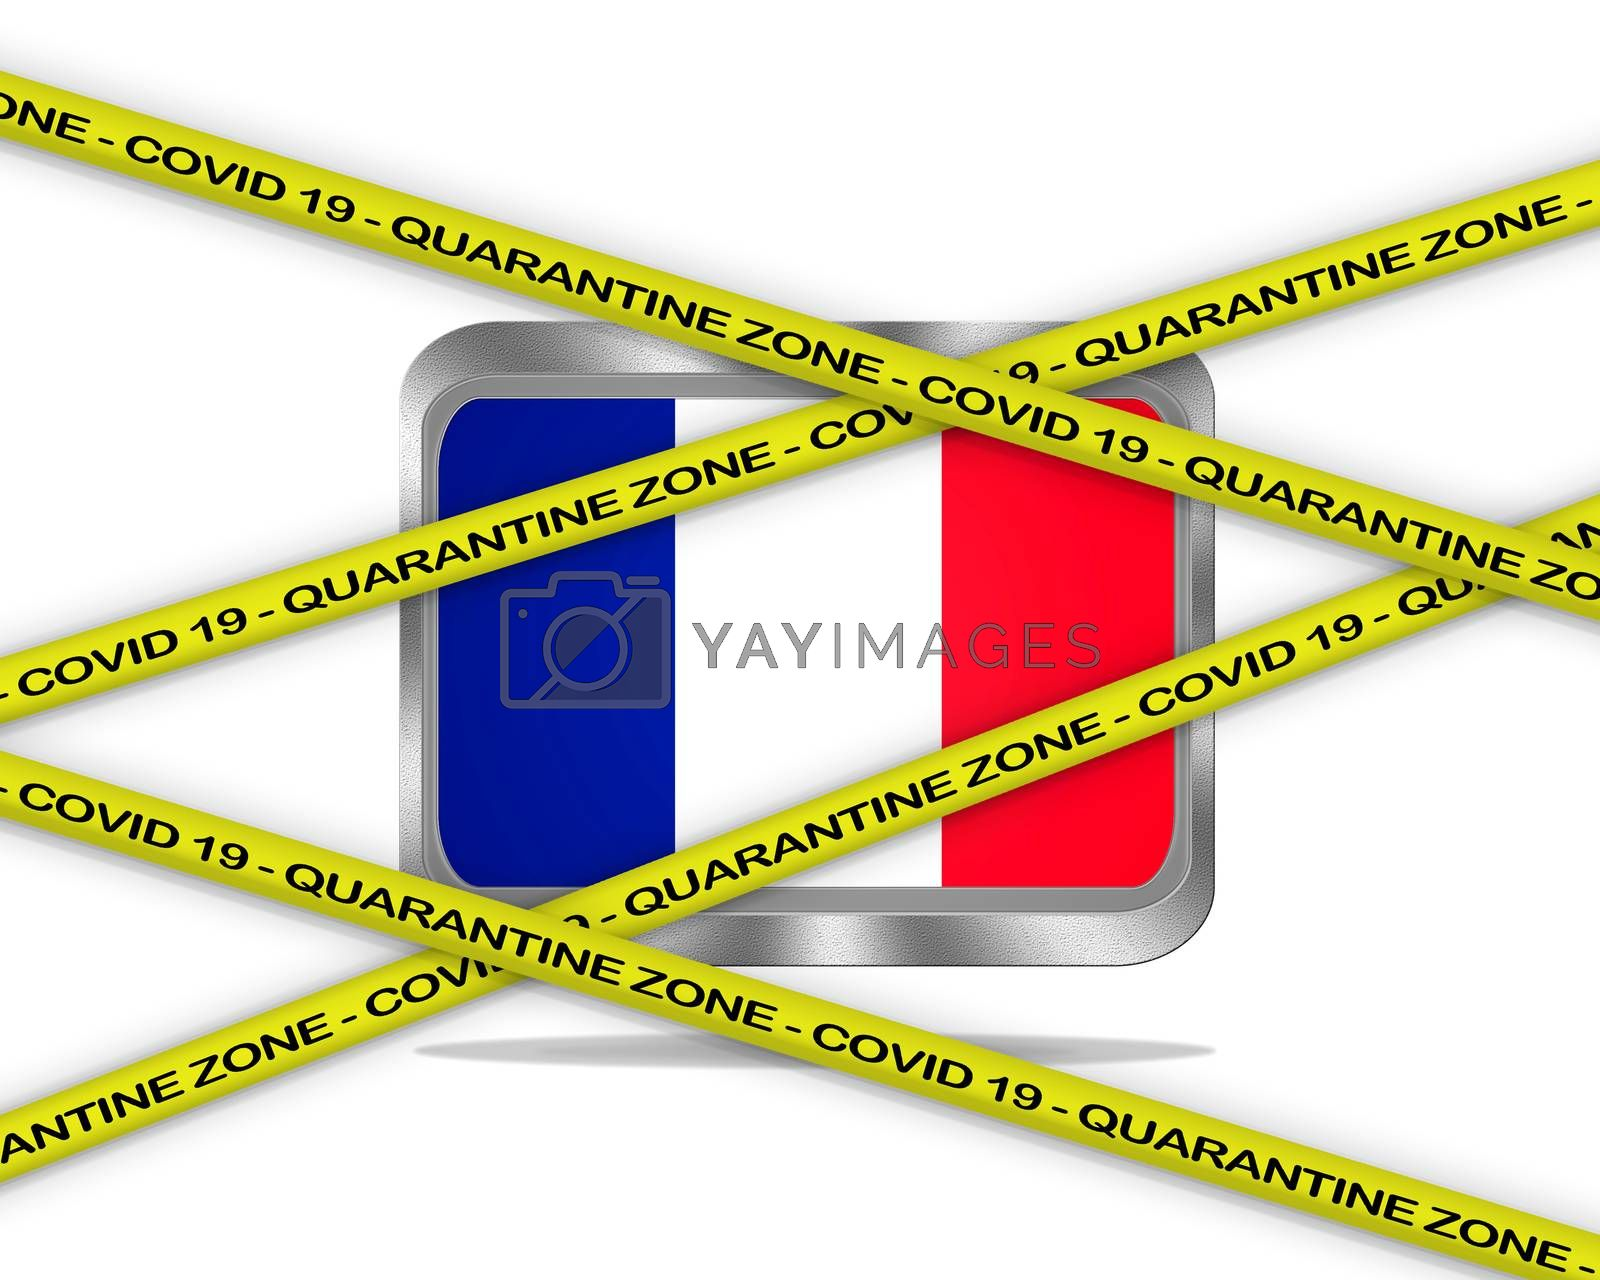 COVID-19 warning yellow ribbon written with: Quarantine zone Cover 19 on France flag illustration. Coronavirus danger area, quarantined country.